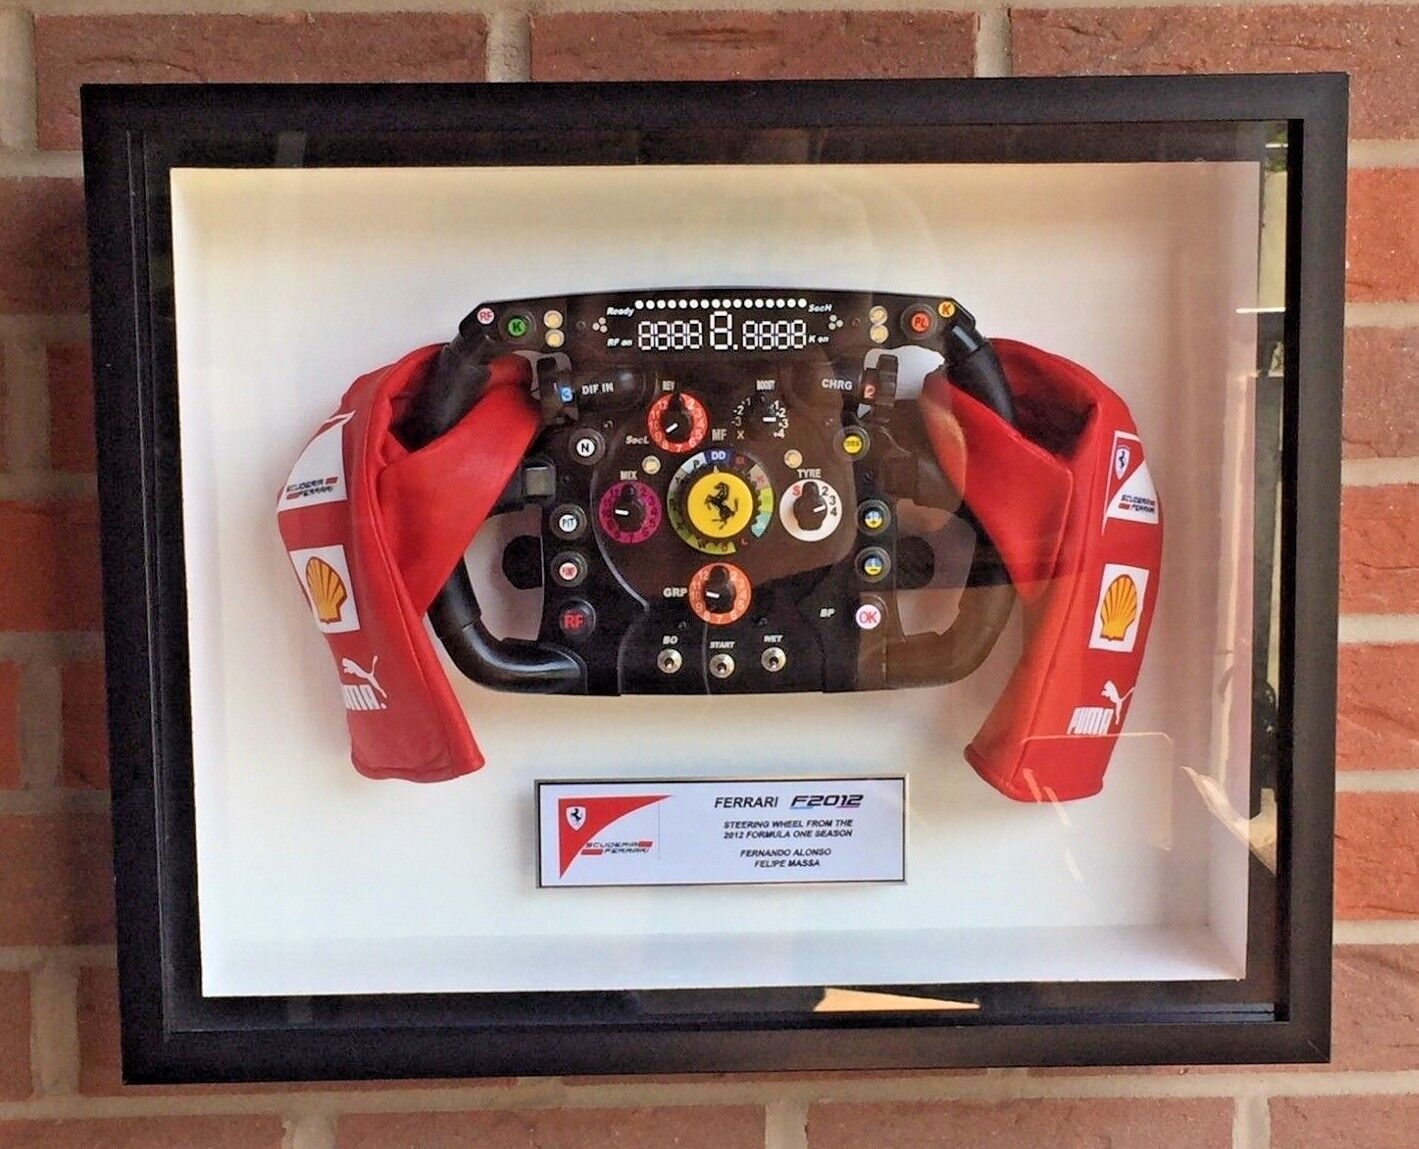 Fernando Alonso 2012 Ferrari F1 Volant formule 1 Replica Full Scale